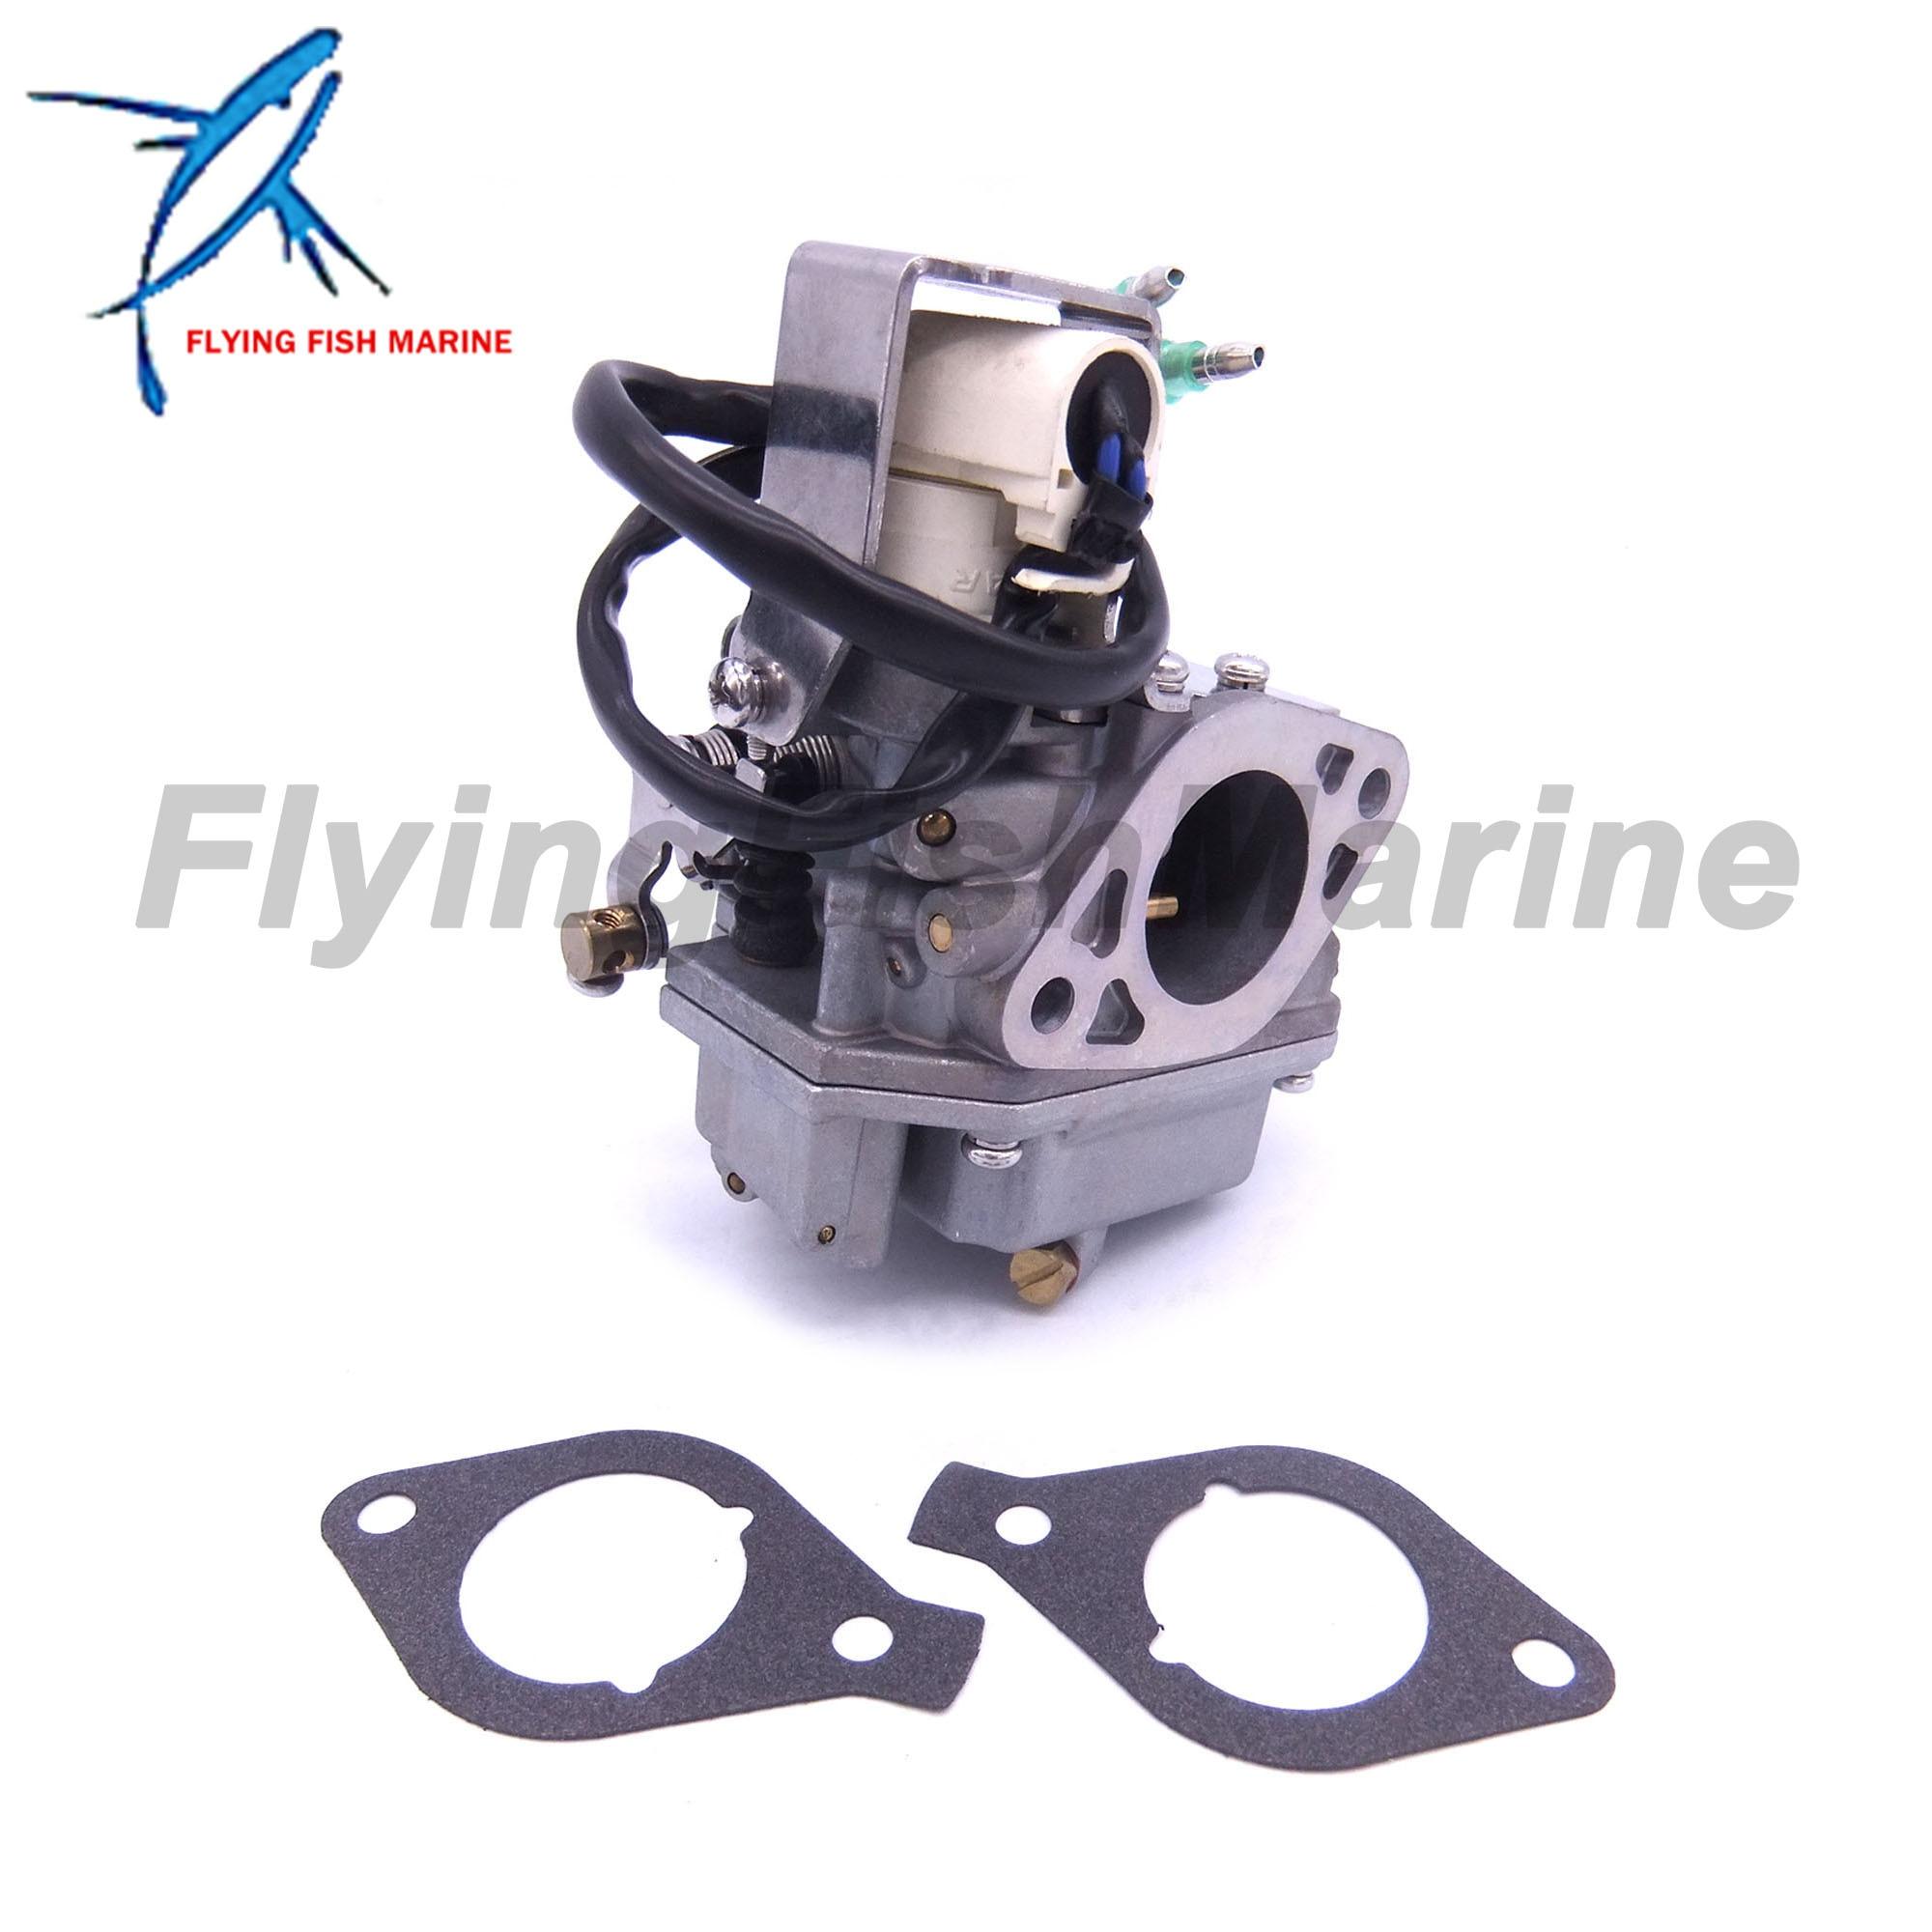 motor de popa 6ah 14301 00 6ah 14301 01 carburador assy e 6ah 13646 00 juntas